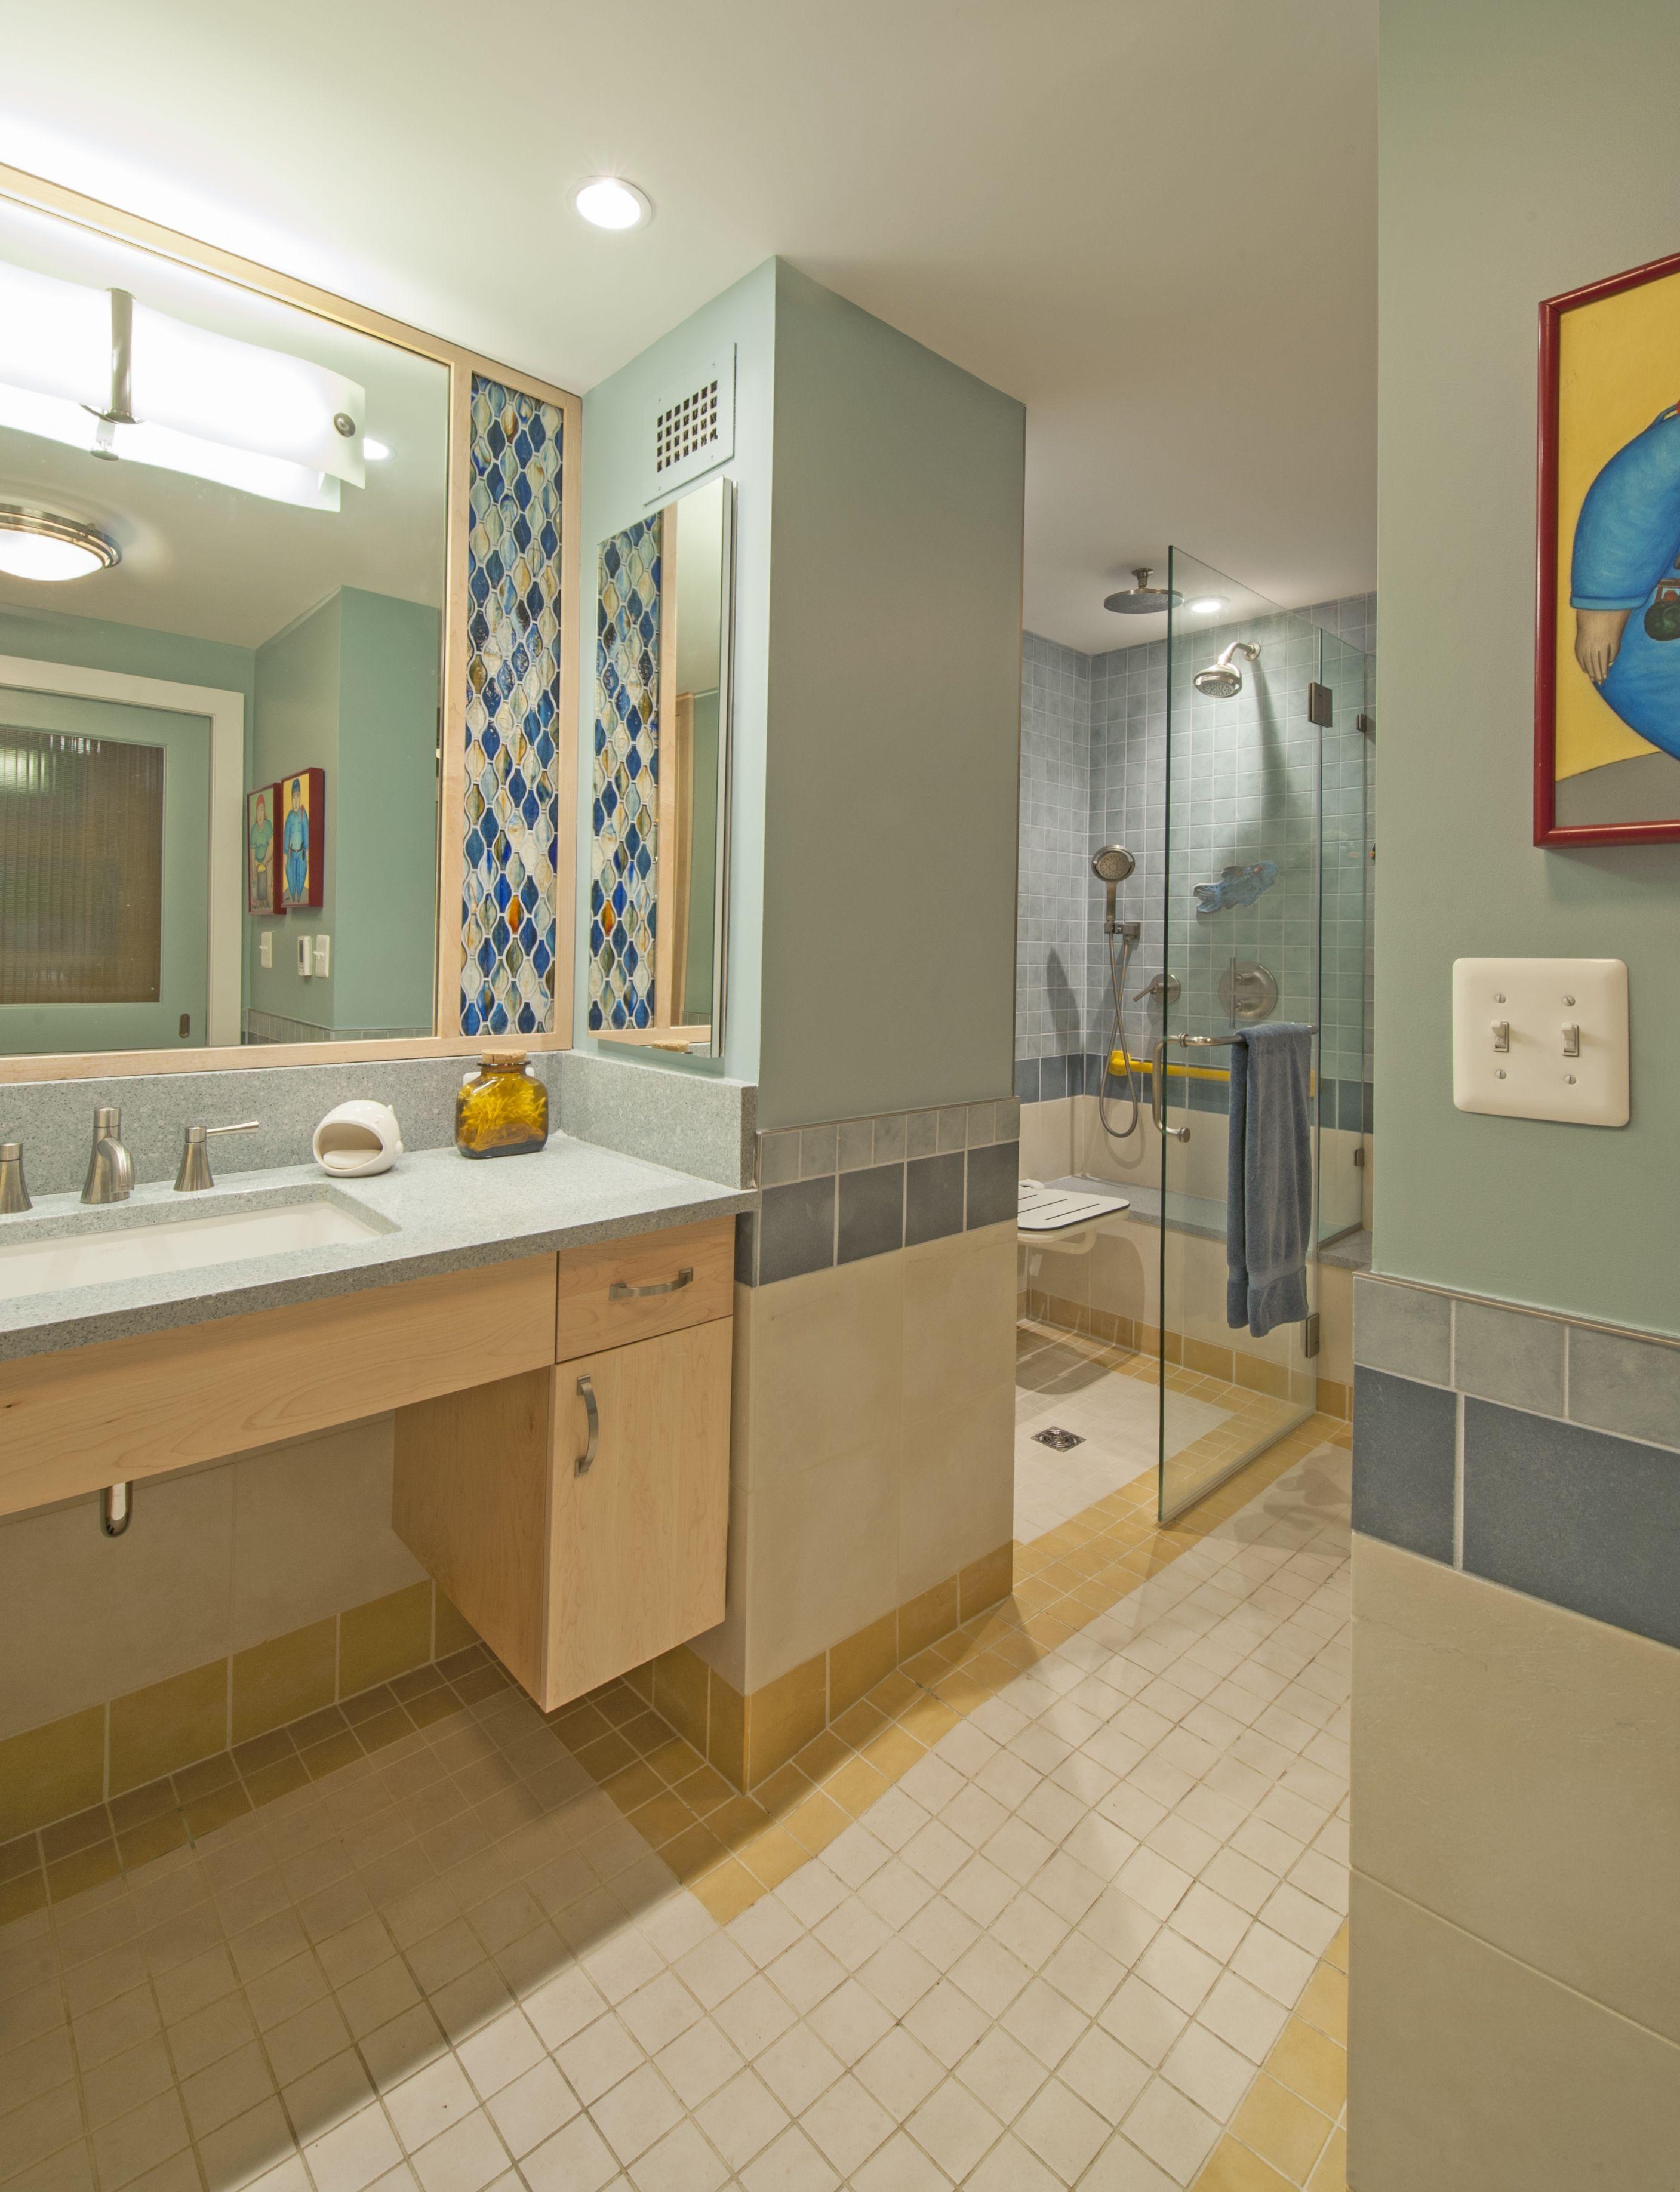 Bathroom Open Shower Design Handicappedbathrooms Get More Info For